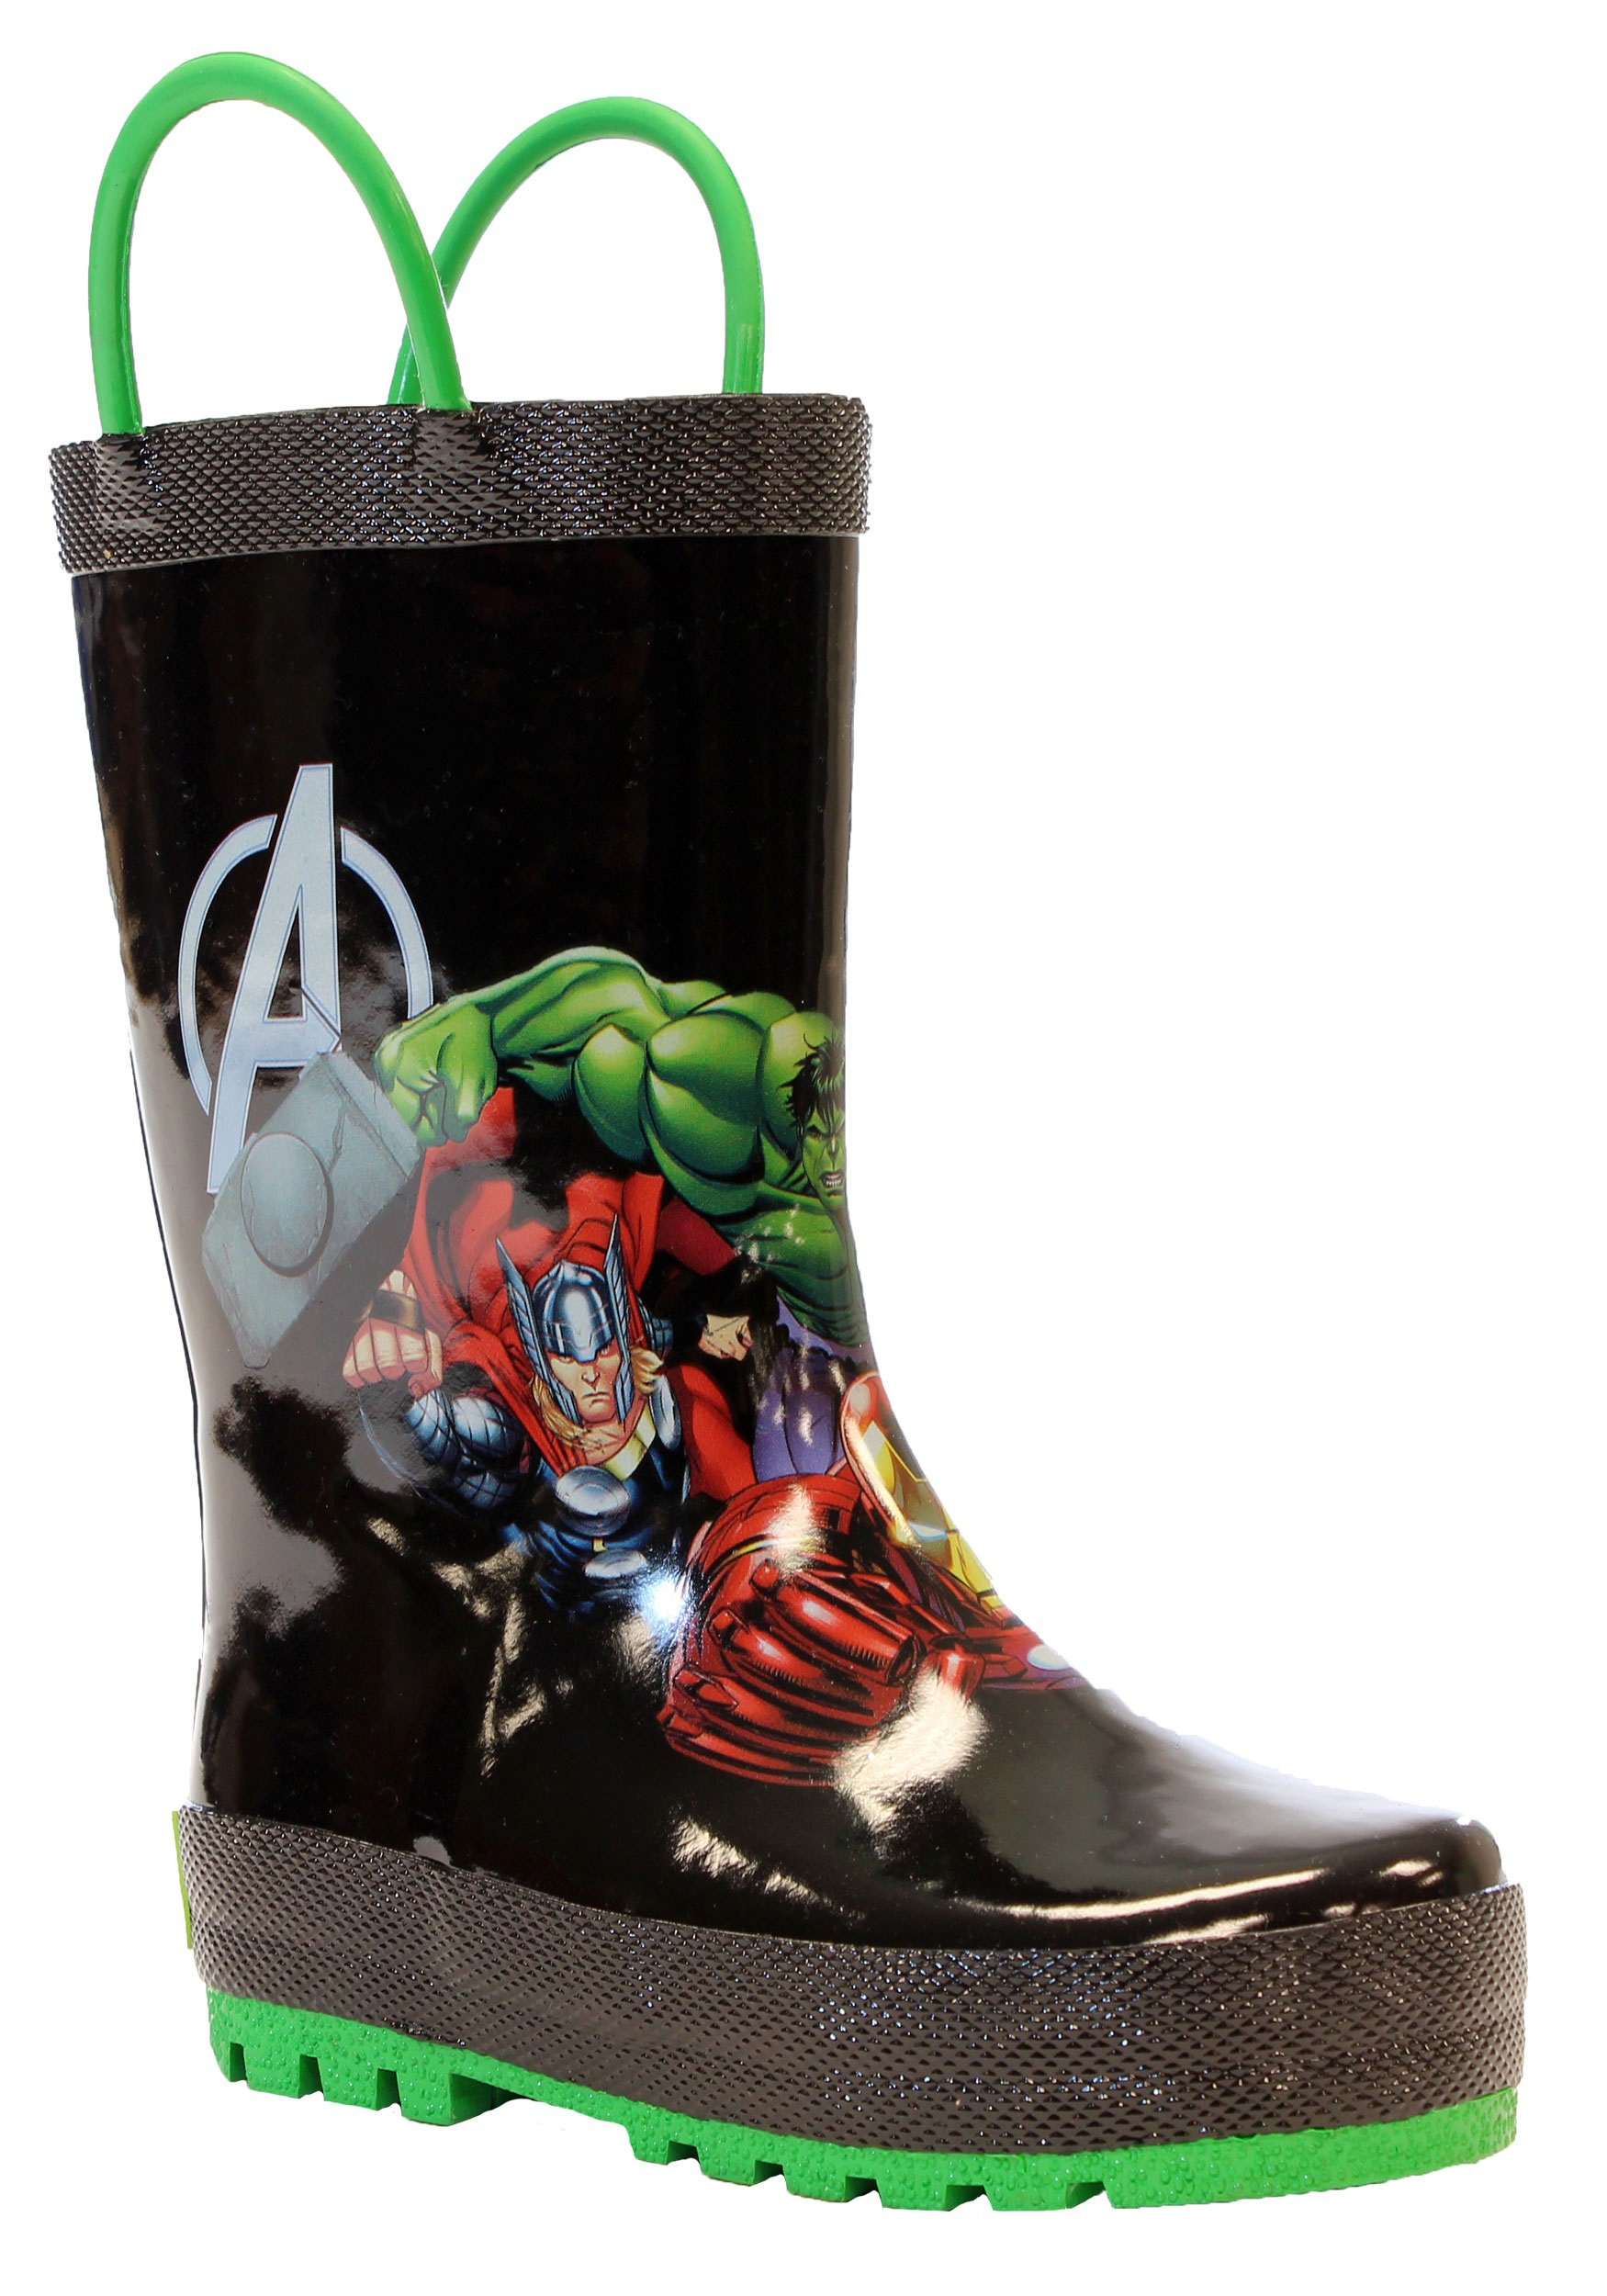 Avengers Child Rain Boots